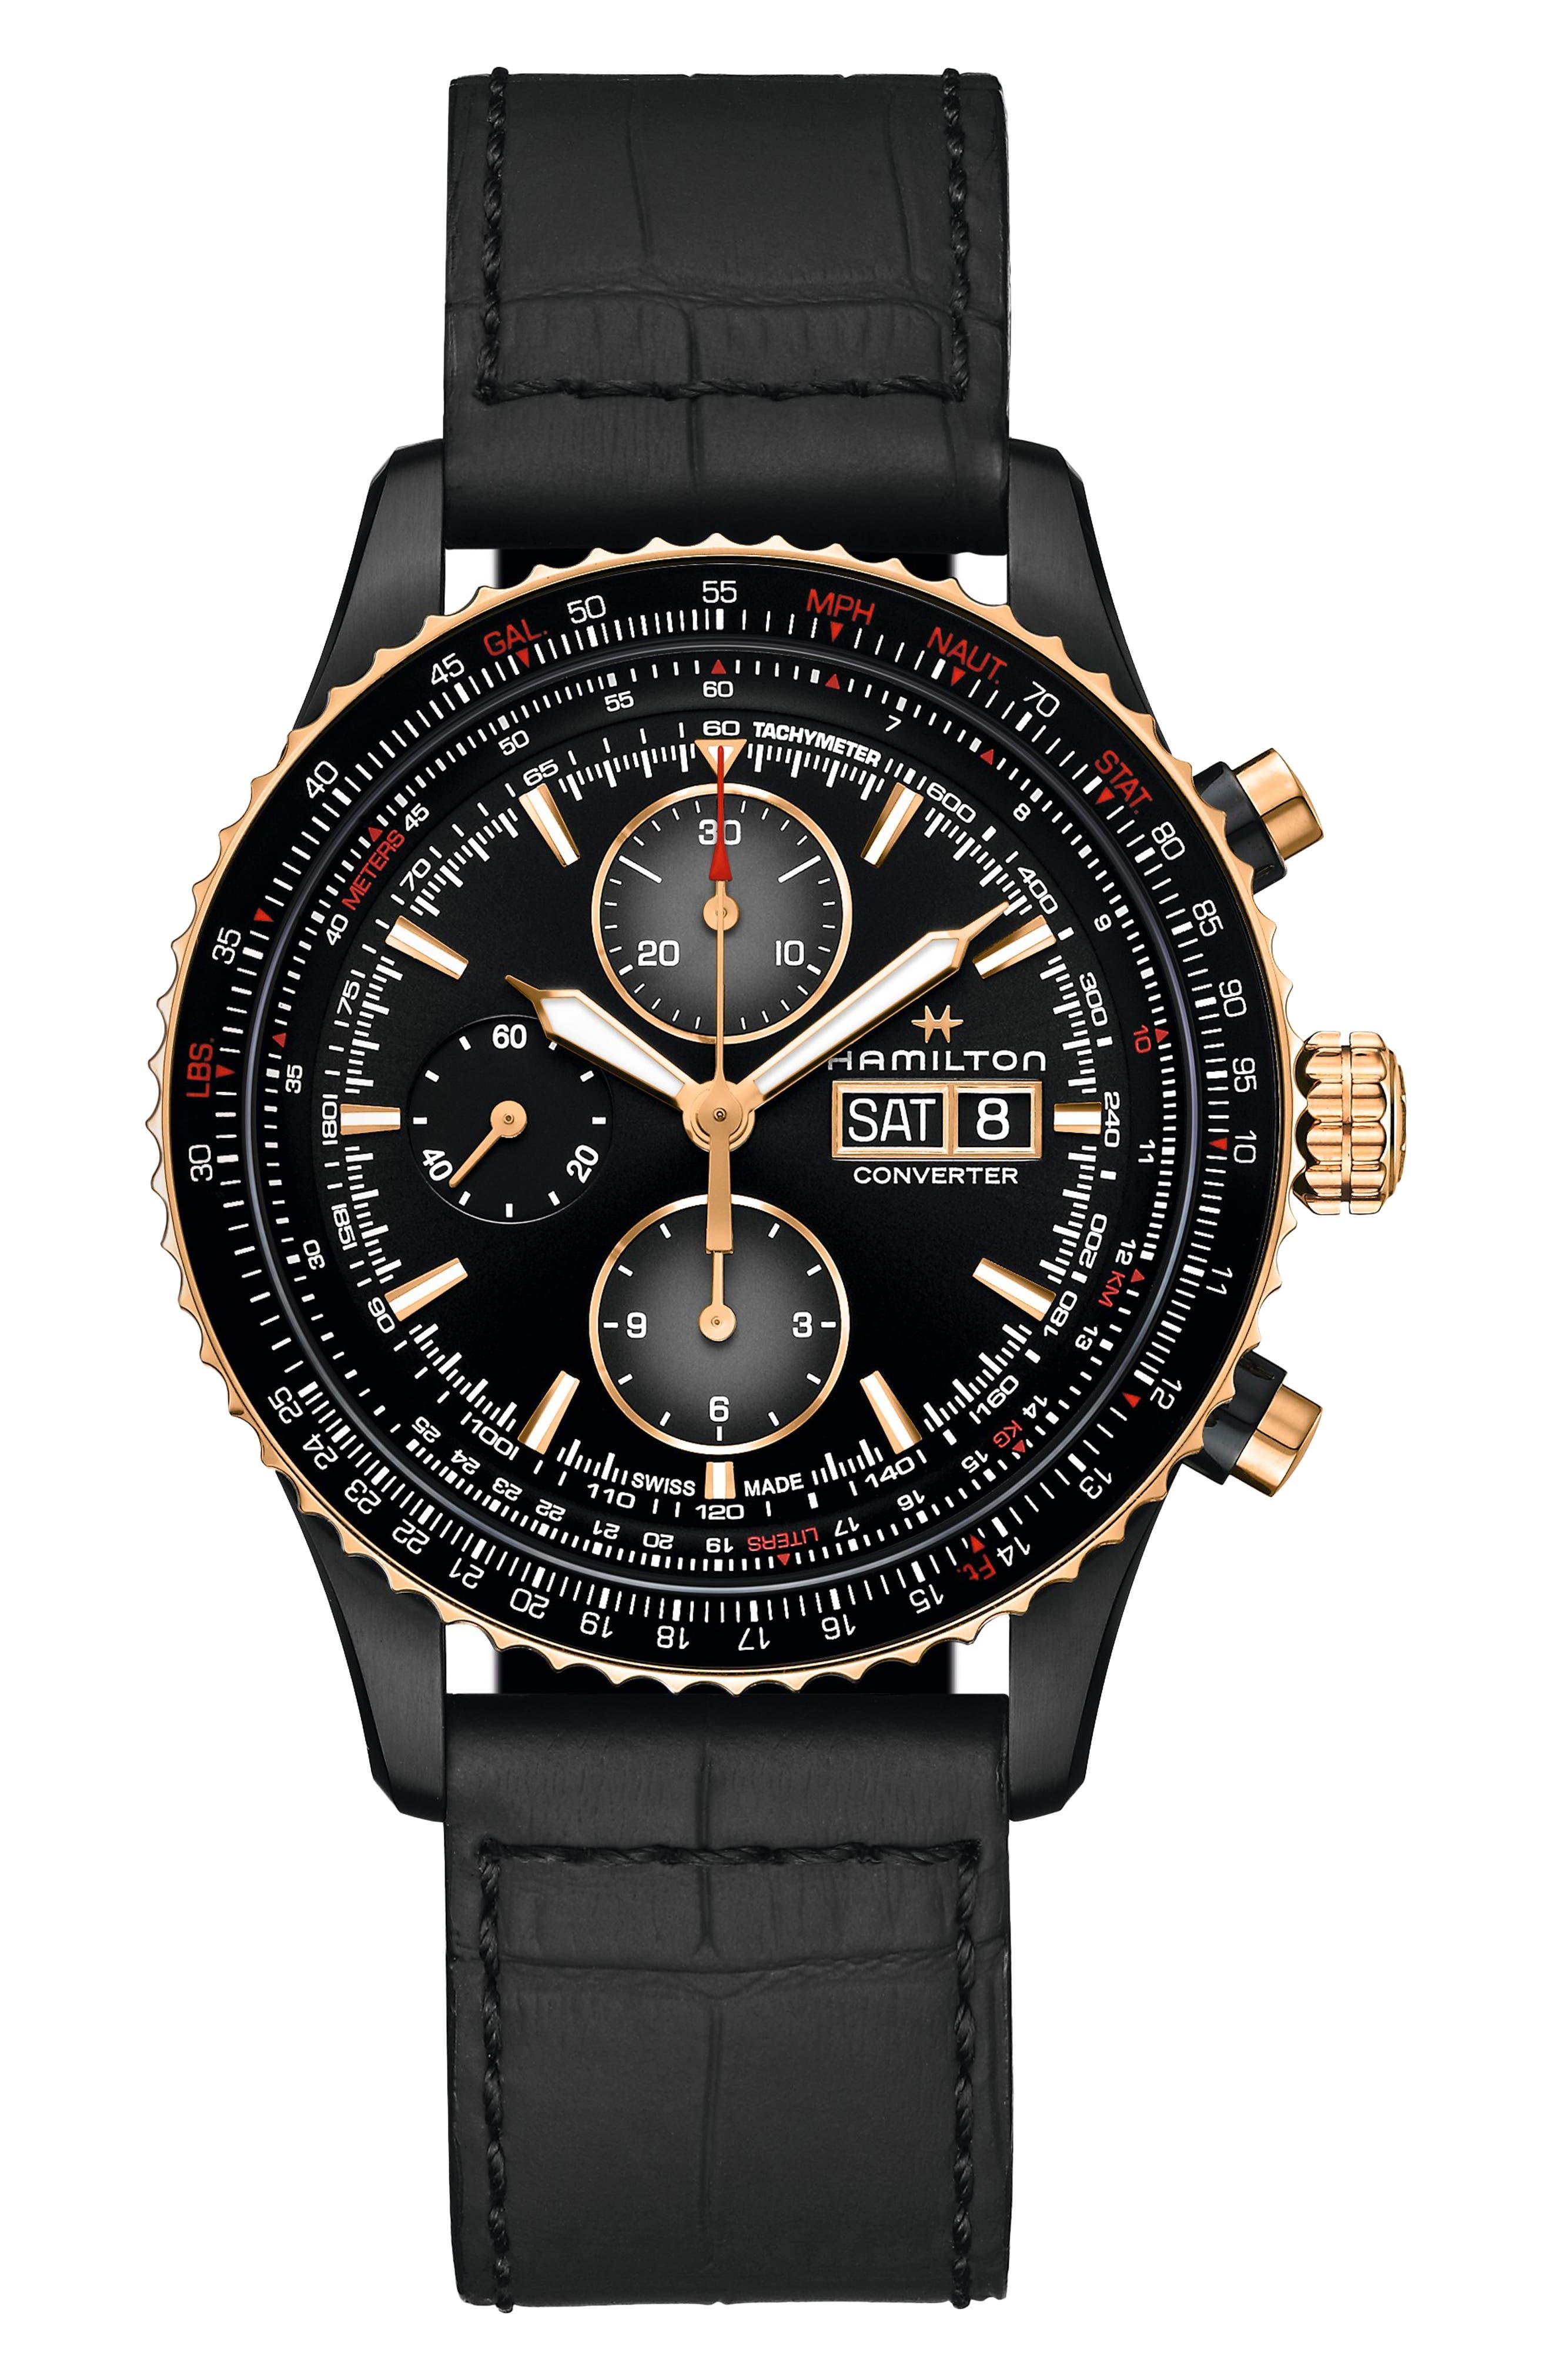 Khaki Aviation Converter Converter Chronograph Leather Strap Watch